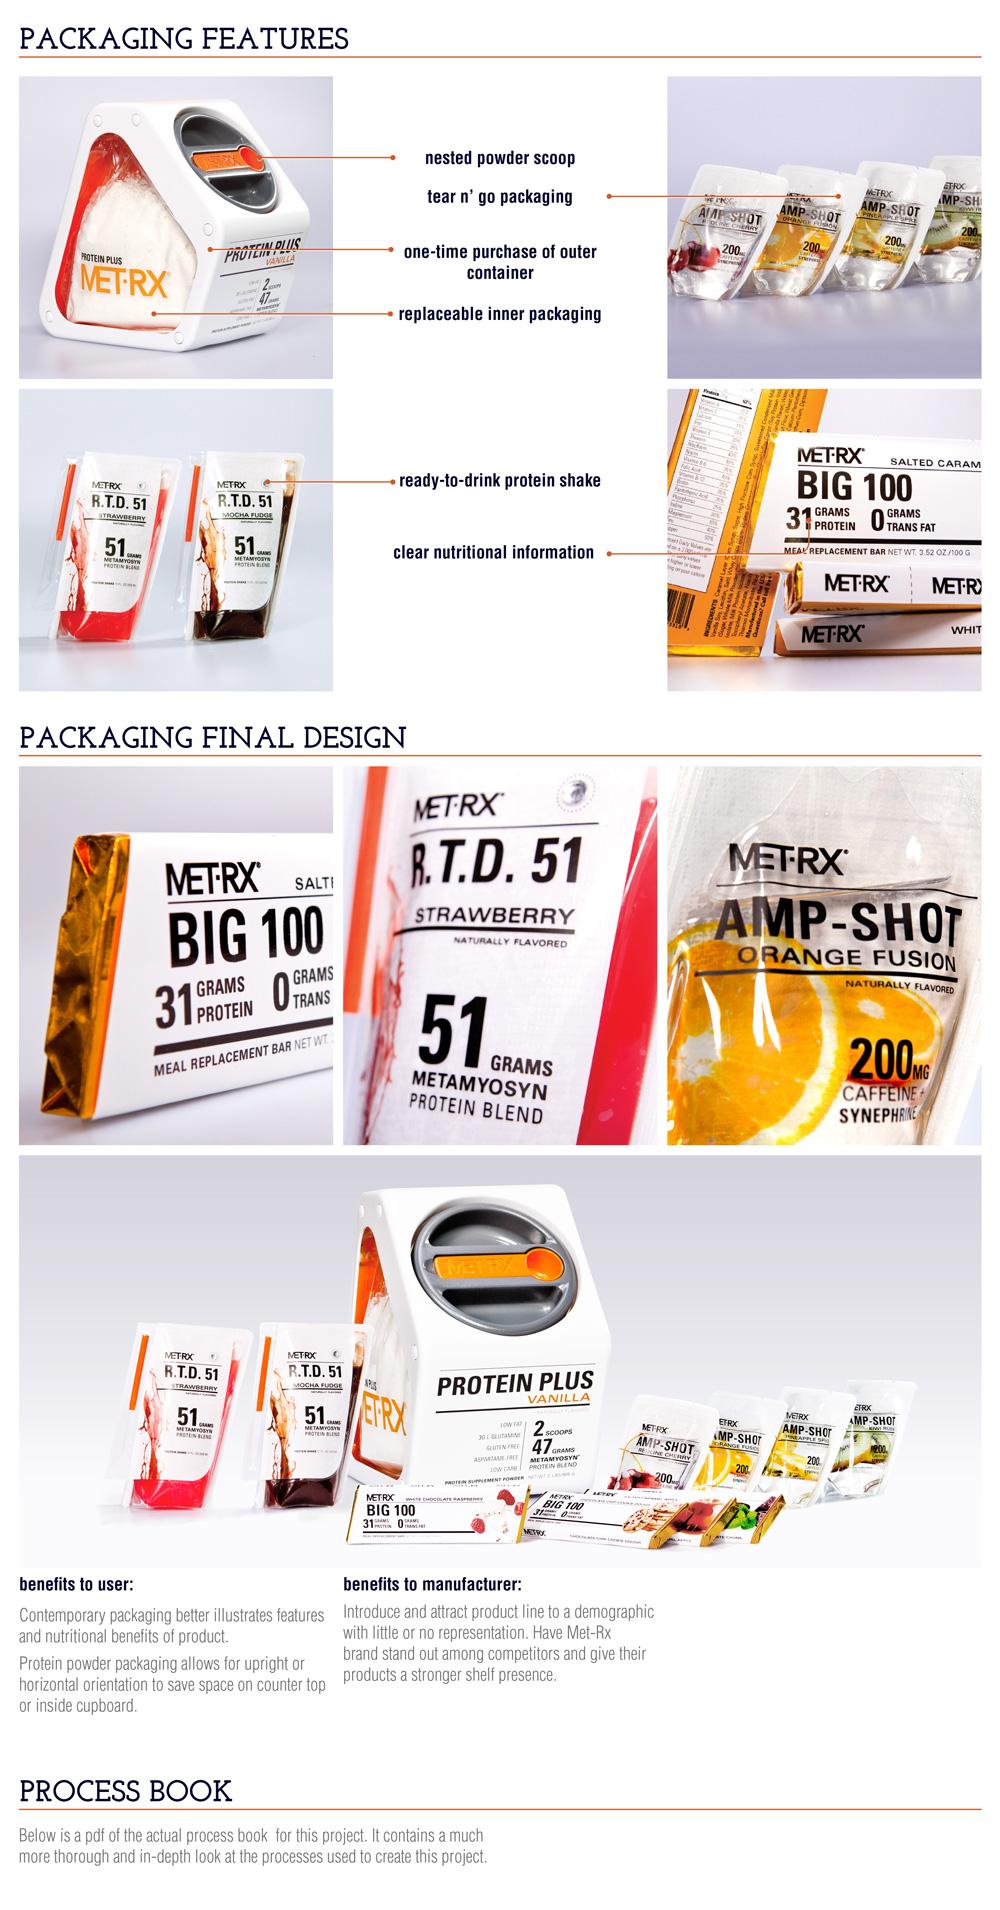 metrx-portfolio-pages9.jpg